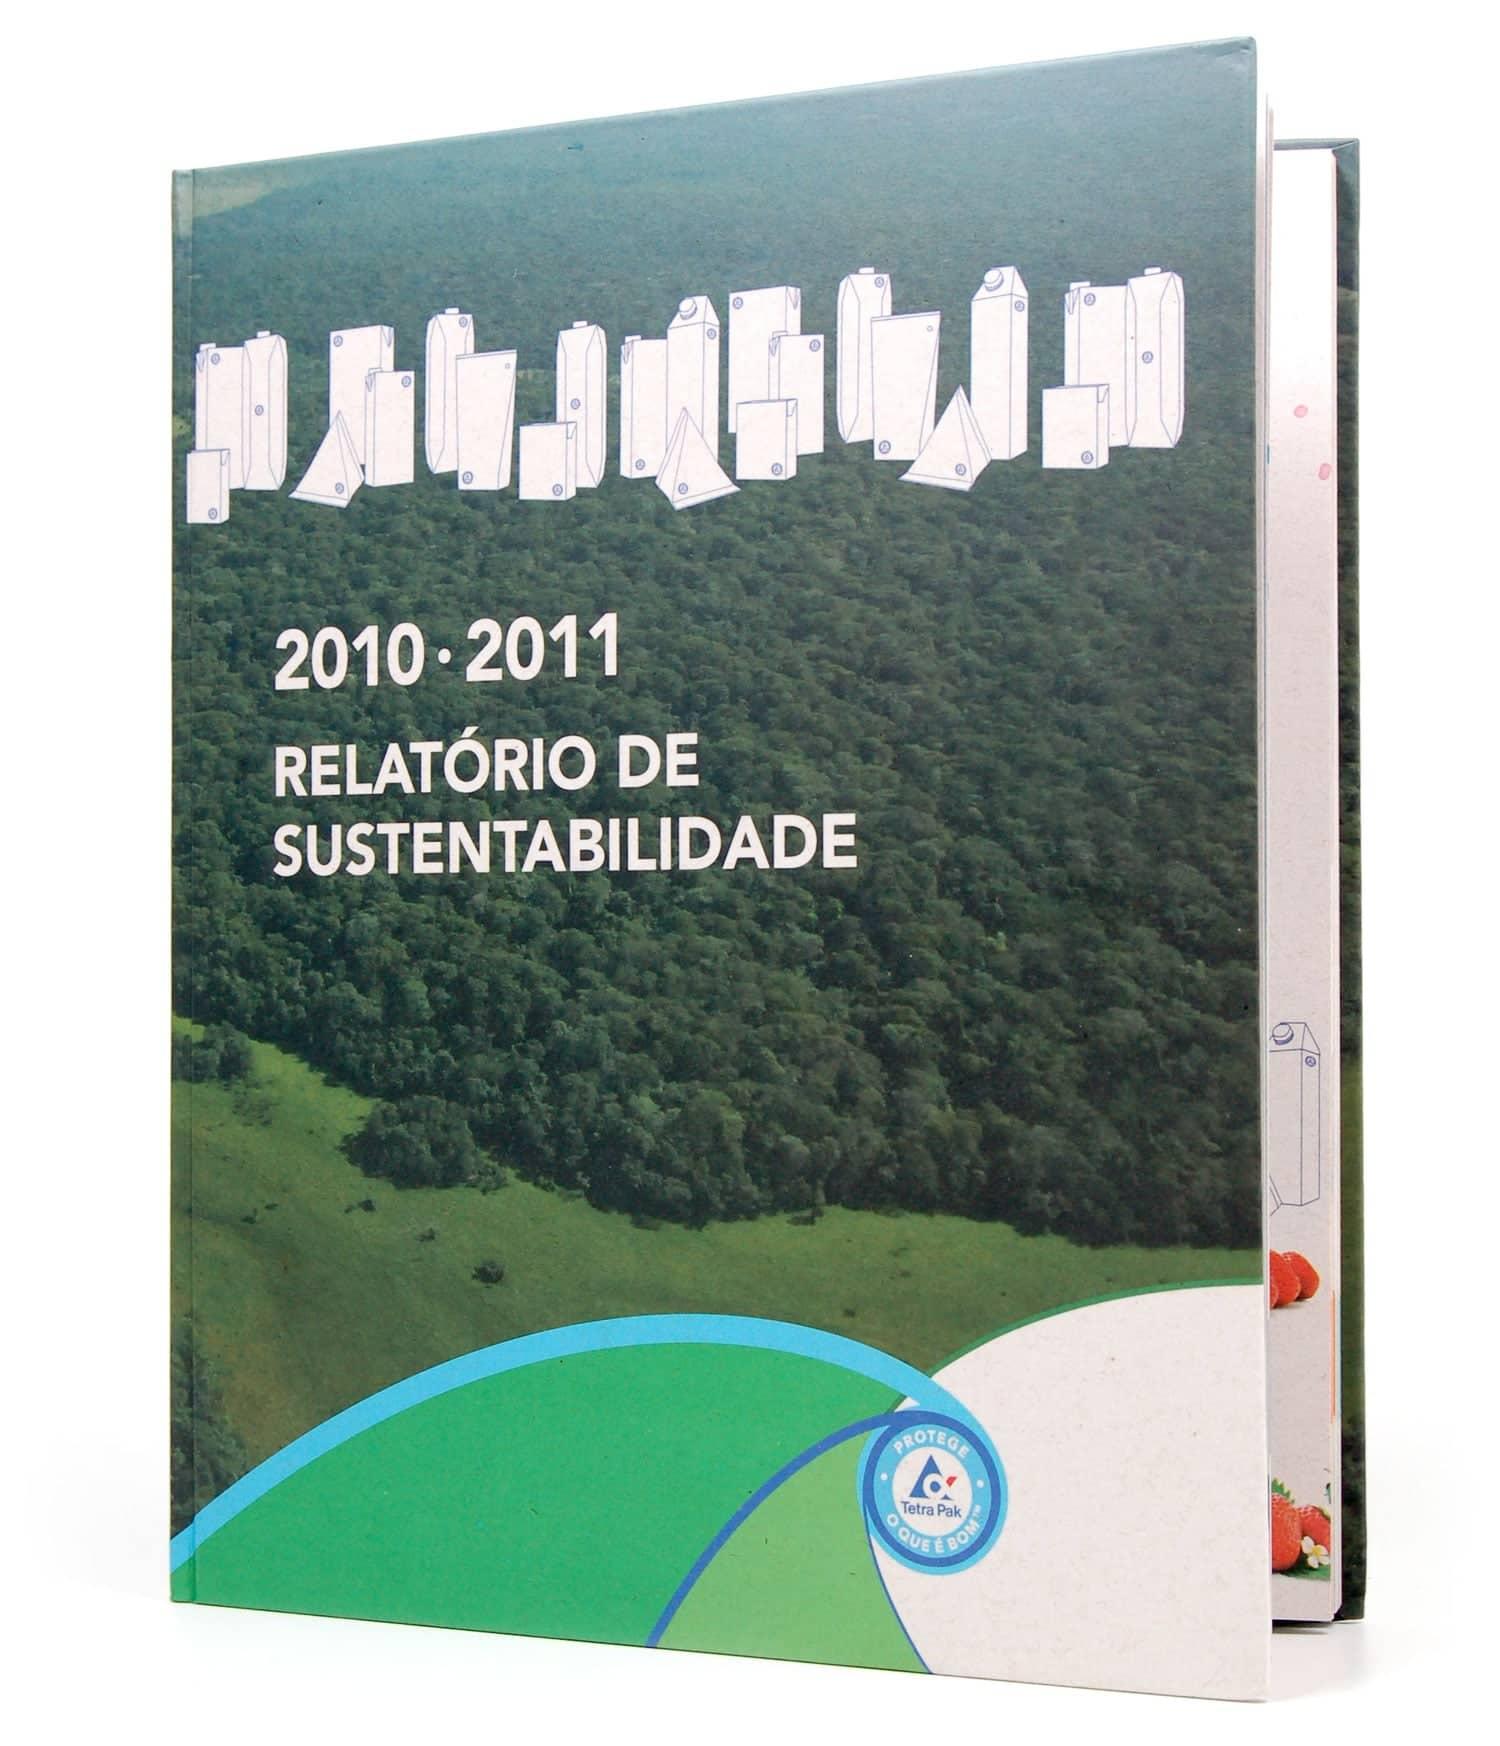 relatorio-de-sustentabilidade-tetra-pak